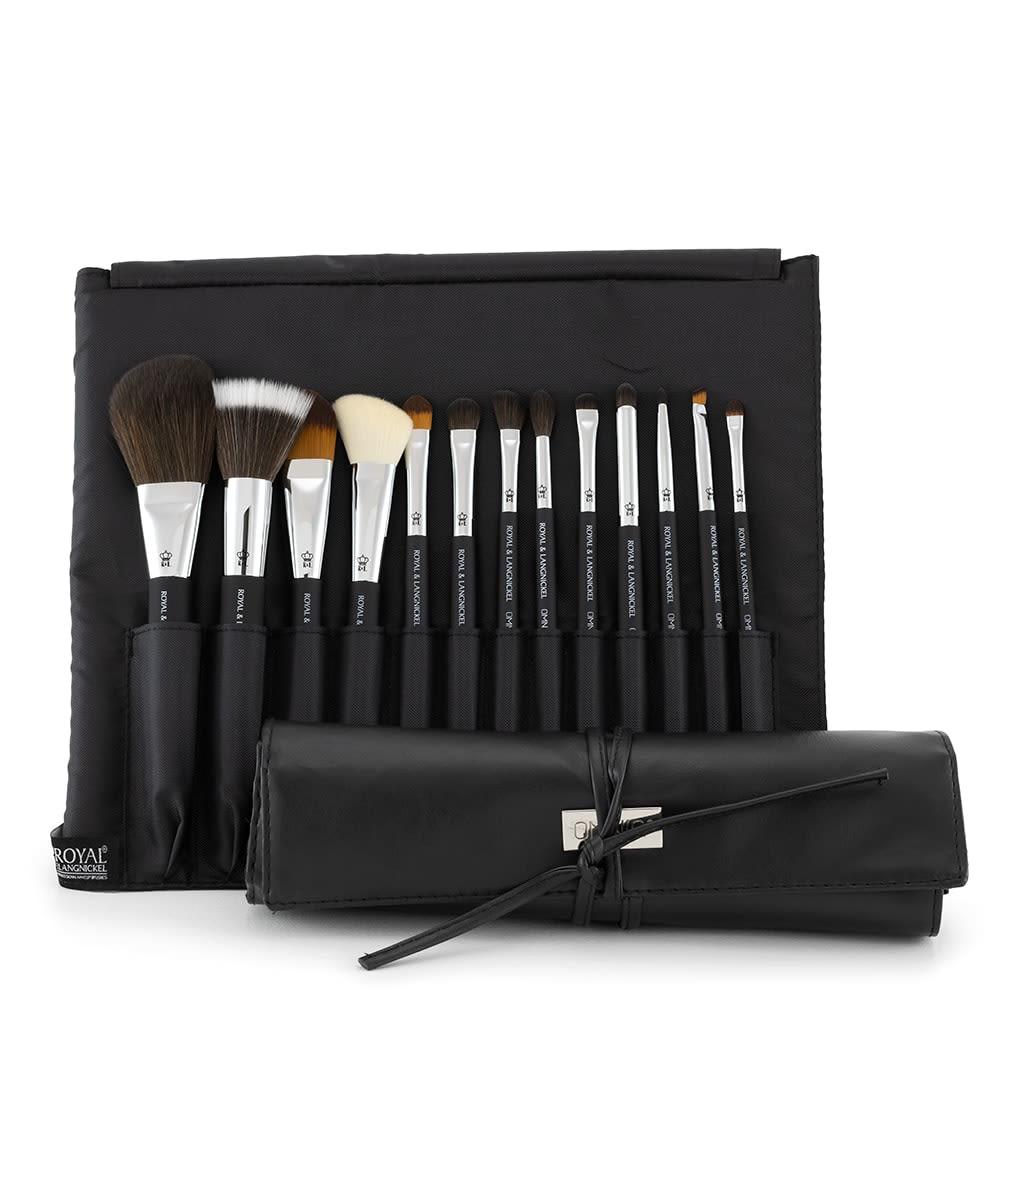 14 pc. Omnia Pro Vegan Brush Set